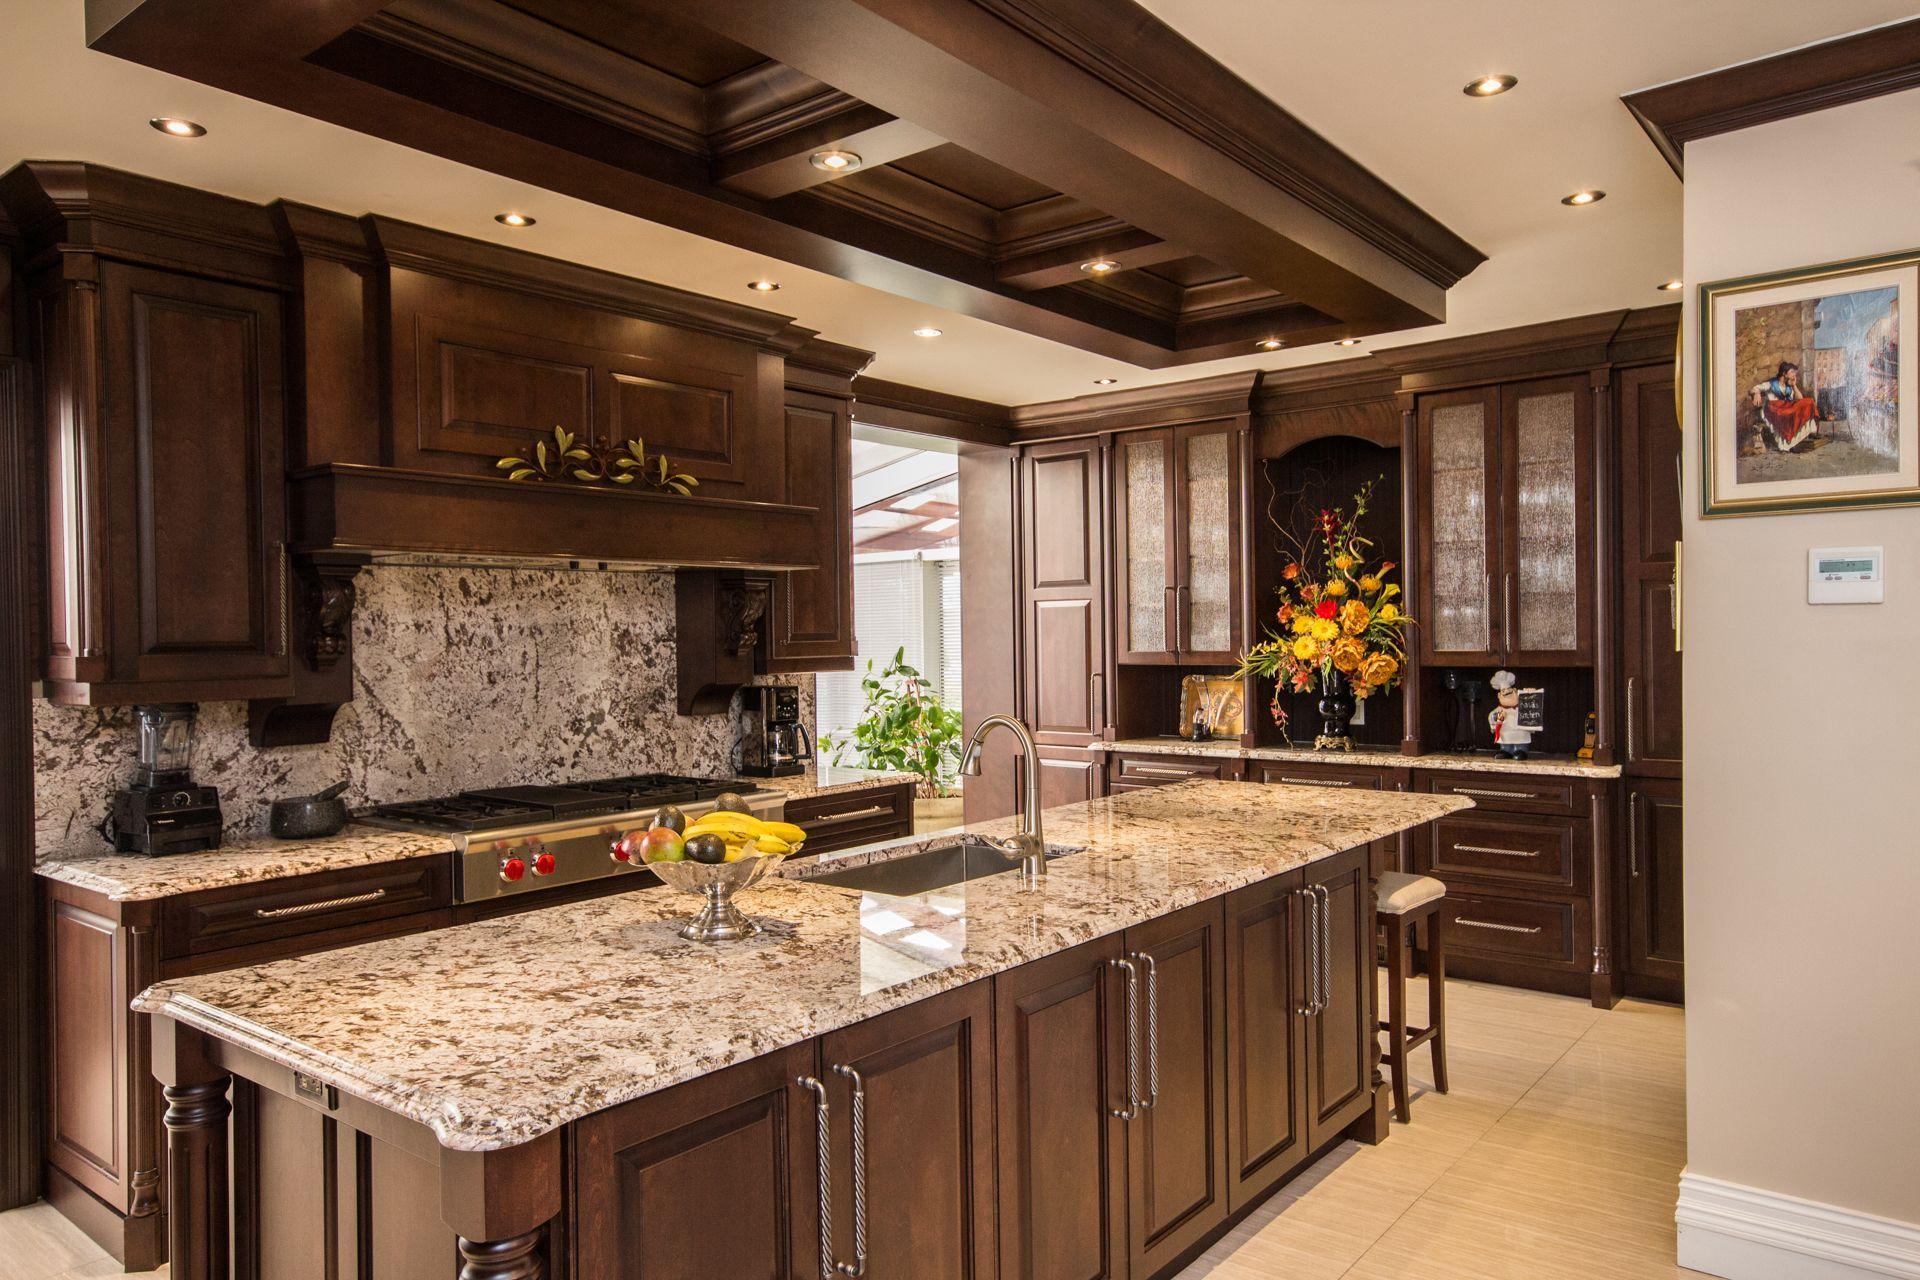 Crotone Kitchens Kcma Certified Quality Cabinets Kitchencabinetmanufacturers Kitchen Cabinet Manufacturers Kitchen Quality Cabinets